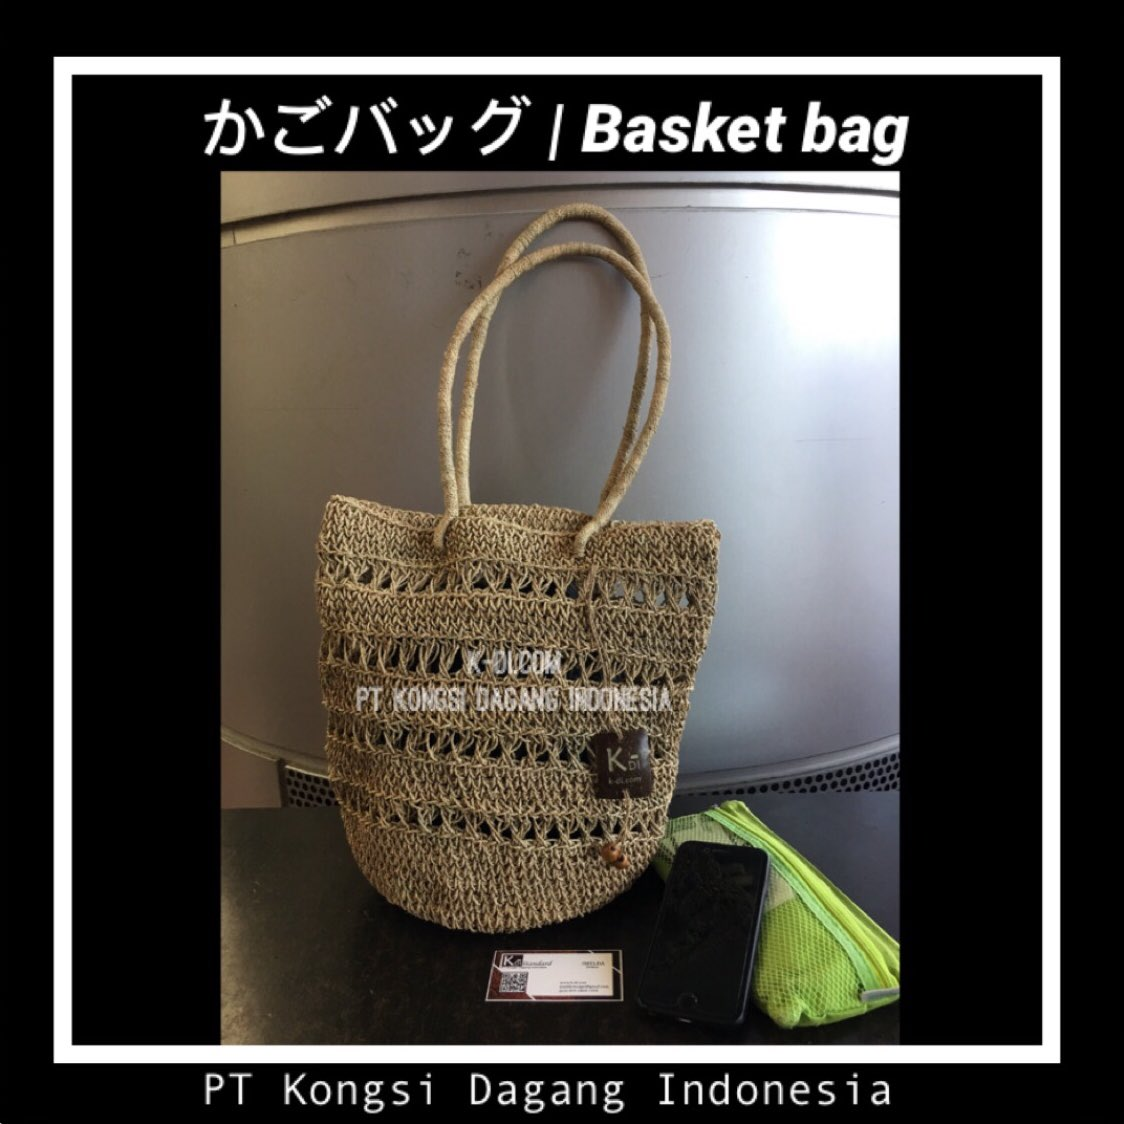 I am Looking for soulmate in business. A business partner, reseller or designer collaboration. Any help..? . .  #かごバッグ #apparel  #골든차일드_보고싶어_사랑해  #japan #かごバッグレッスン @Tou_Ryu_mon #basketbag #rakunten #japanesefashion @mahoyaku_info #Tokyo @usagi_kanaepic.twitter.com/RcQ8FyFT7q